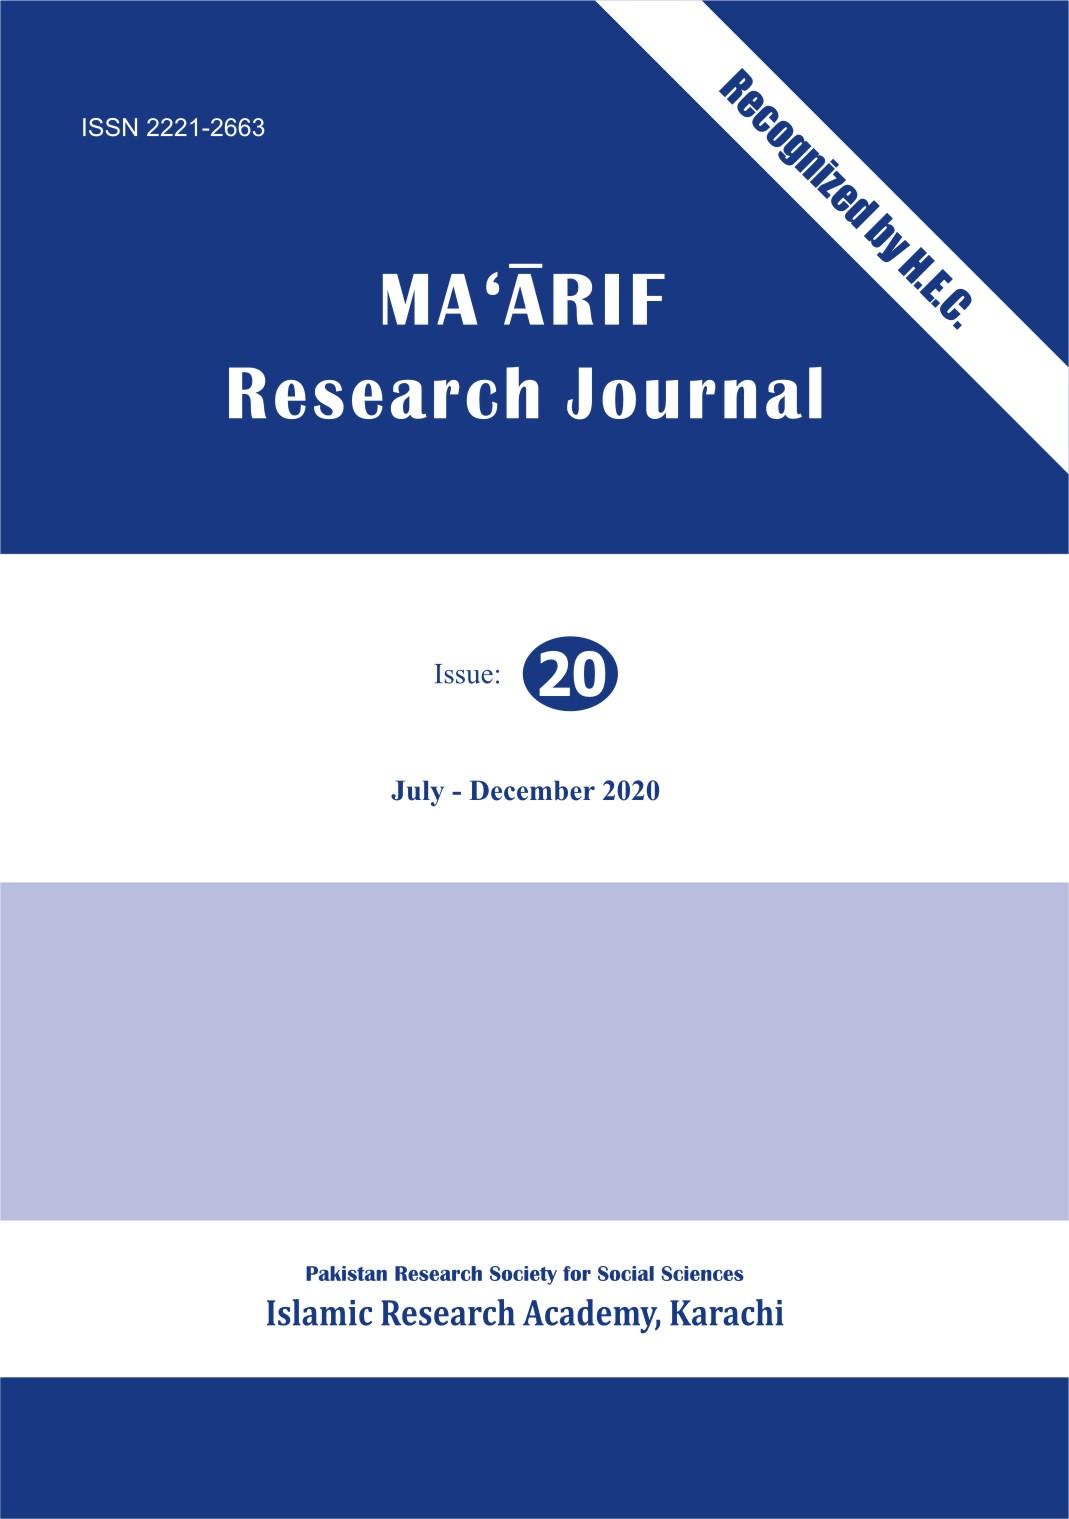 View No. 20 (20): Ma'ārif Research Journal